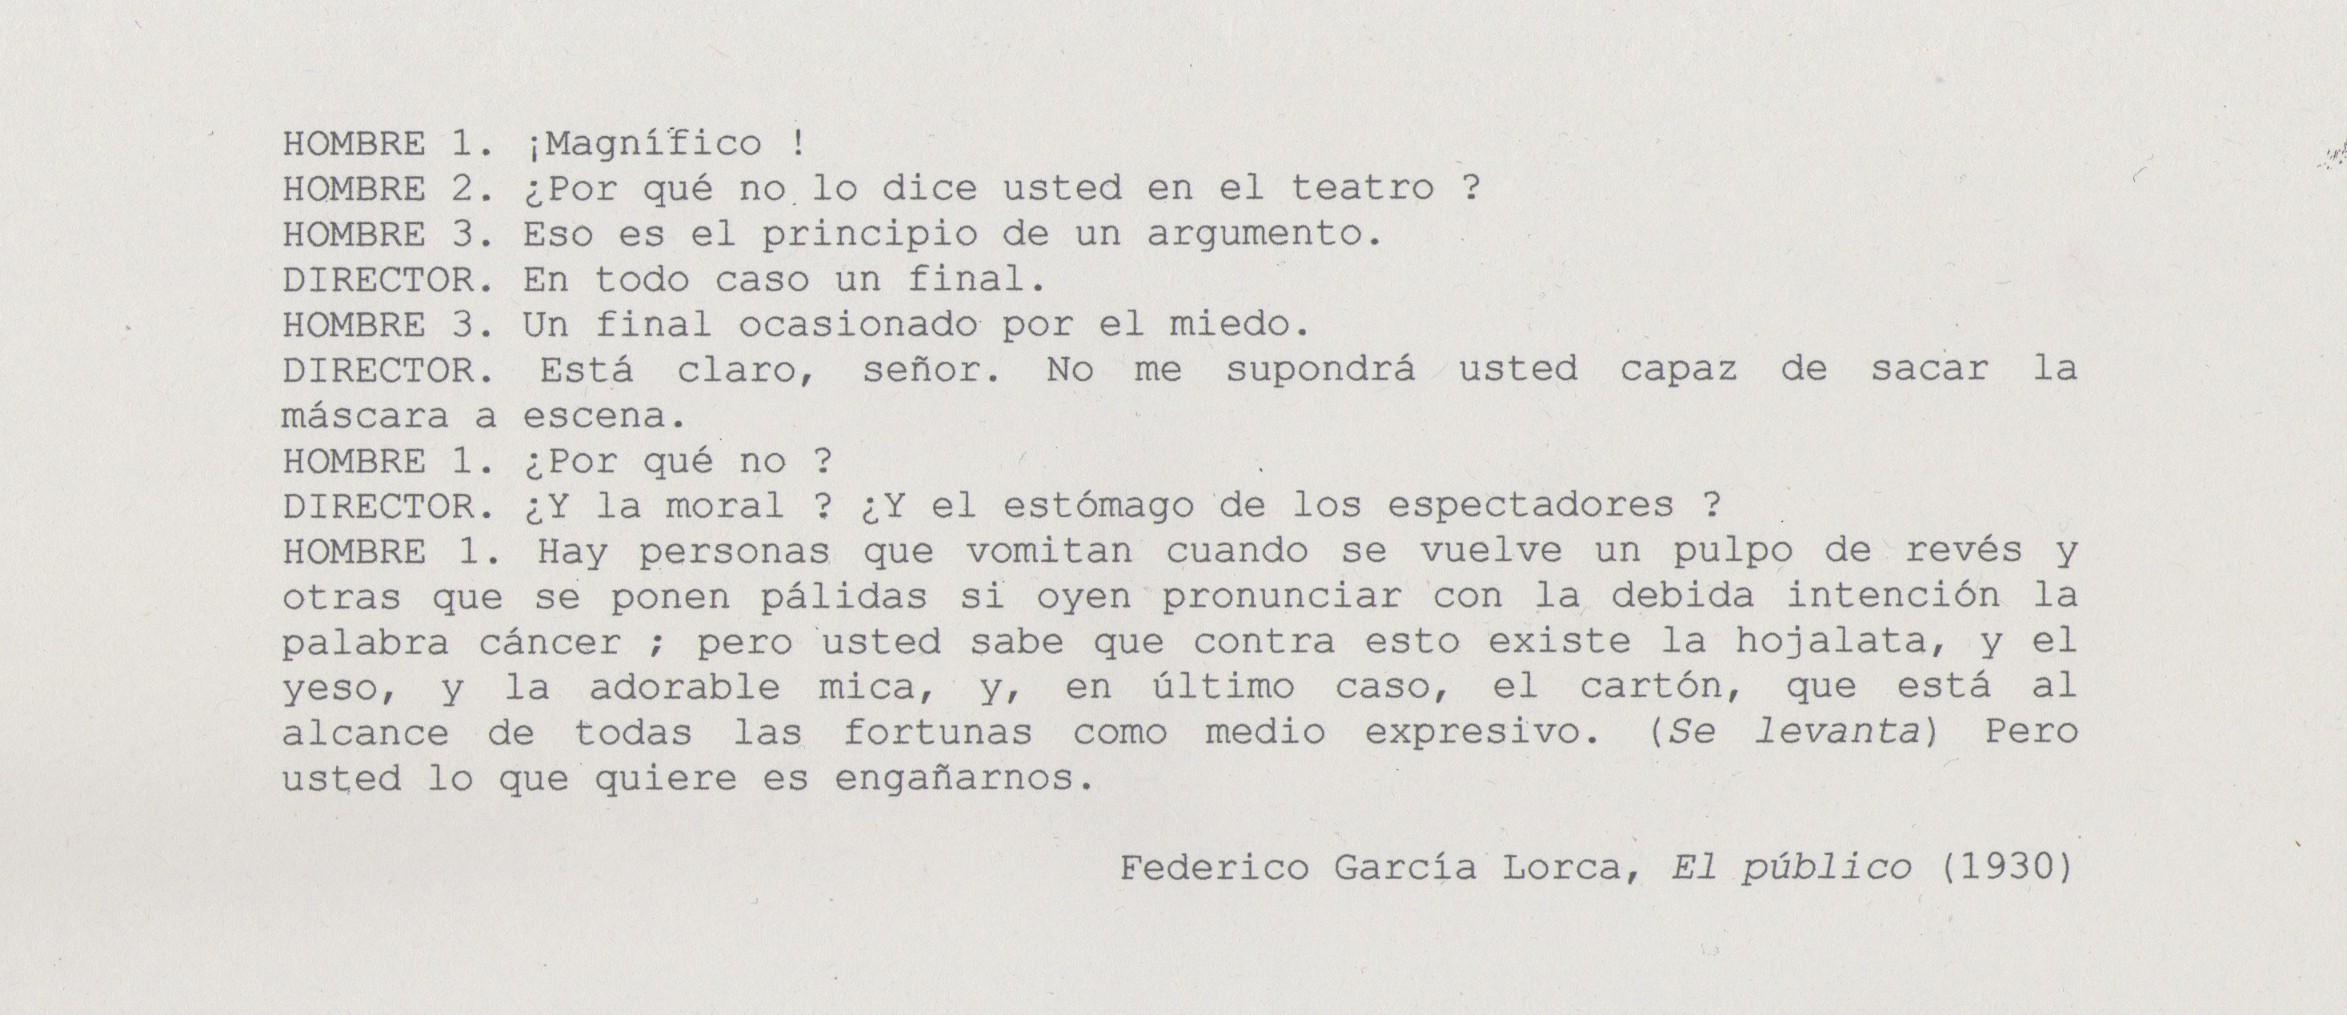 Cita Lorca, El público